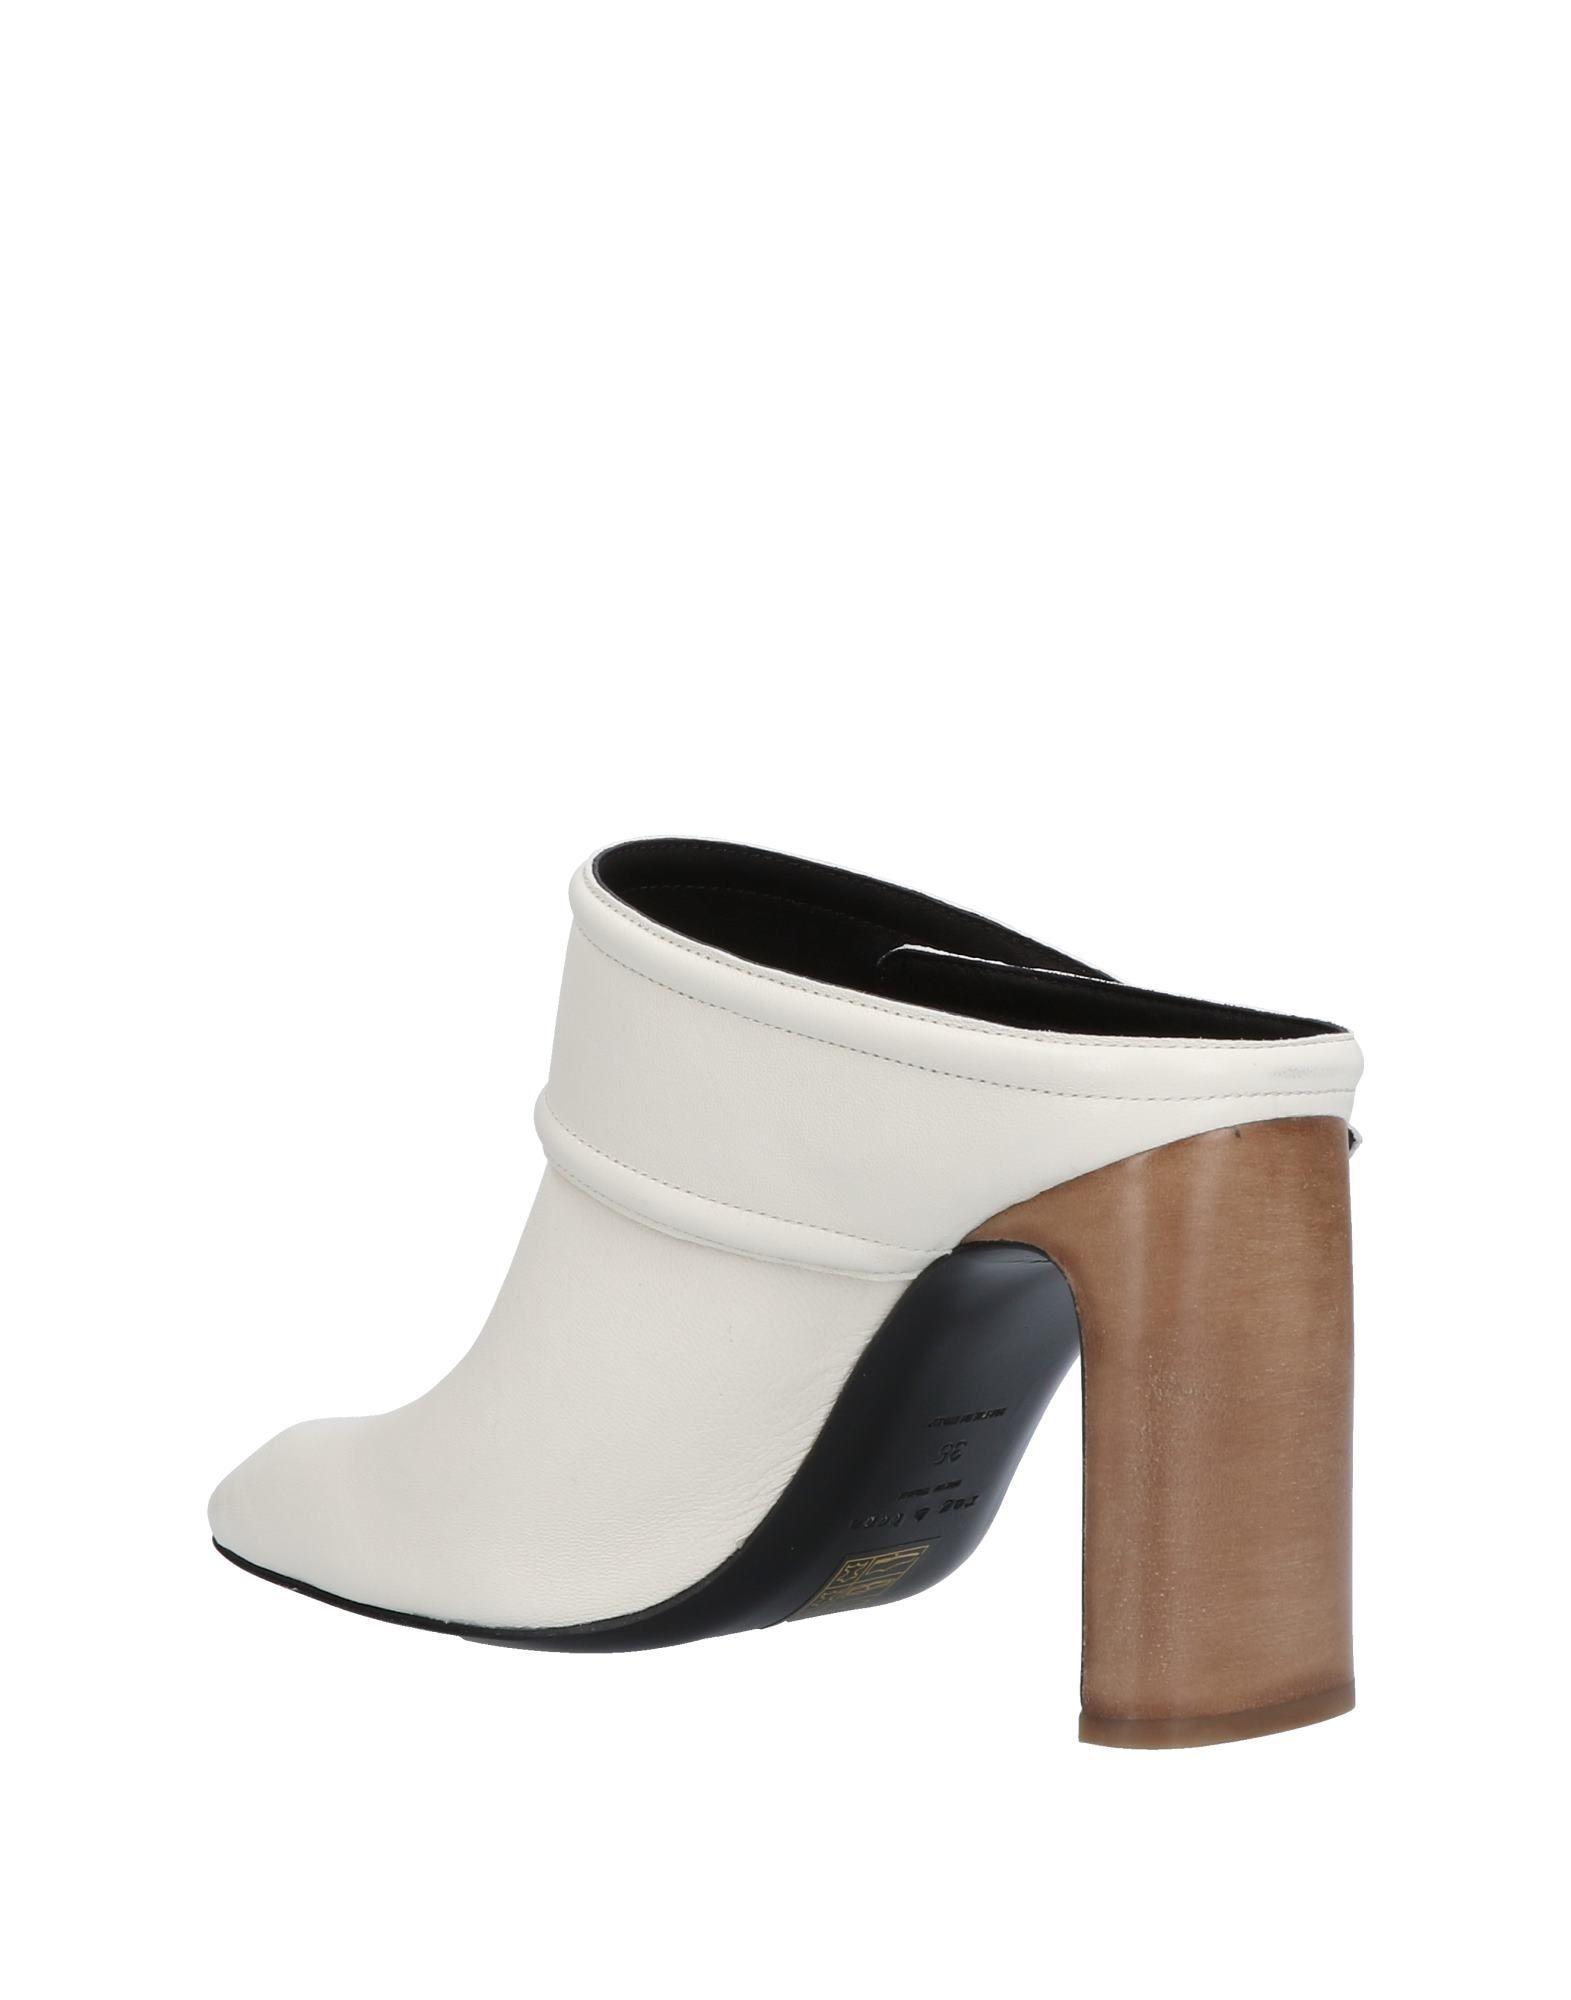 Rabatt Bone Schuhe Rag & Bone Rabatt Pantoletten Damen  11472940NL ded11c